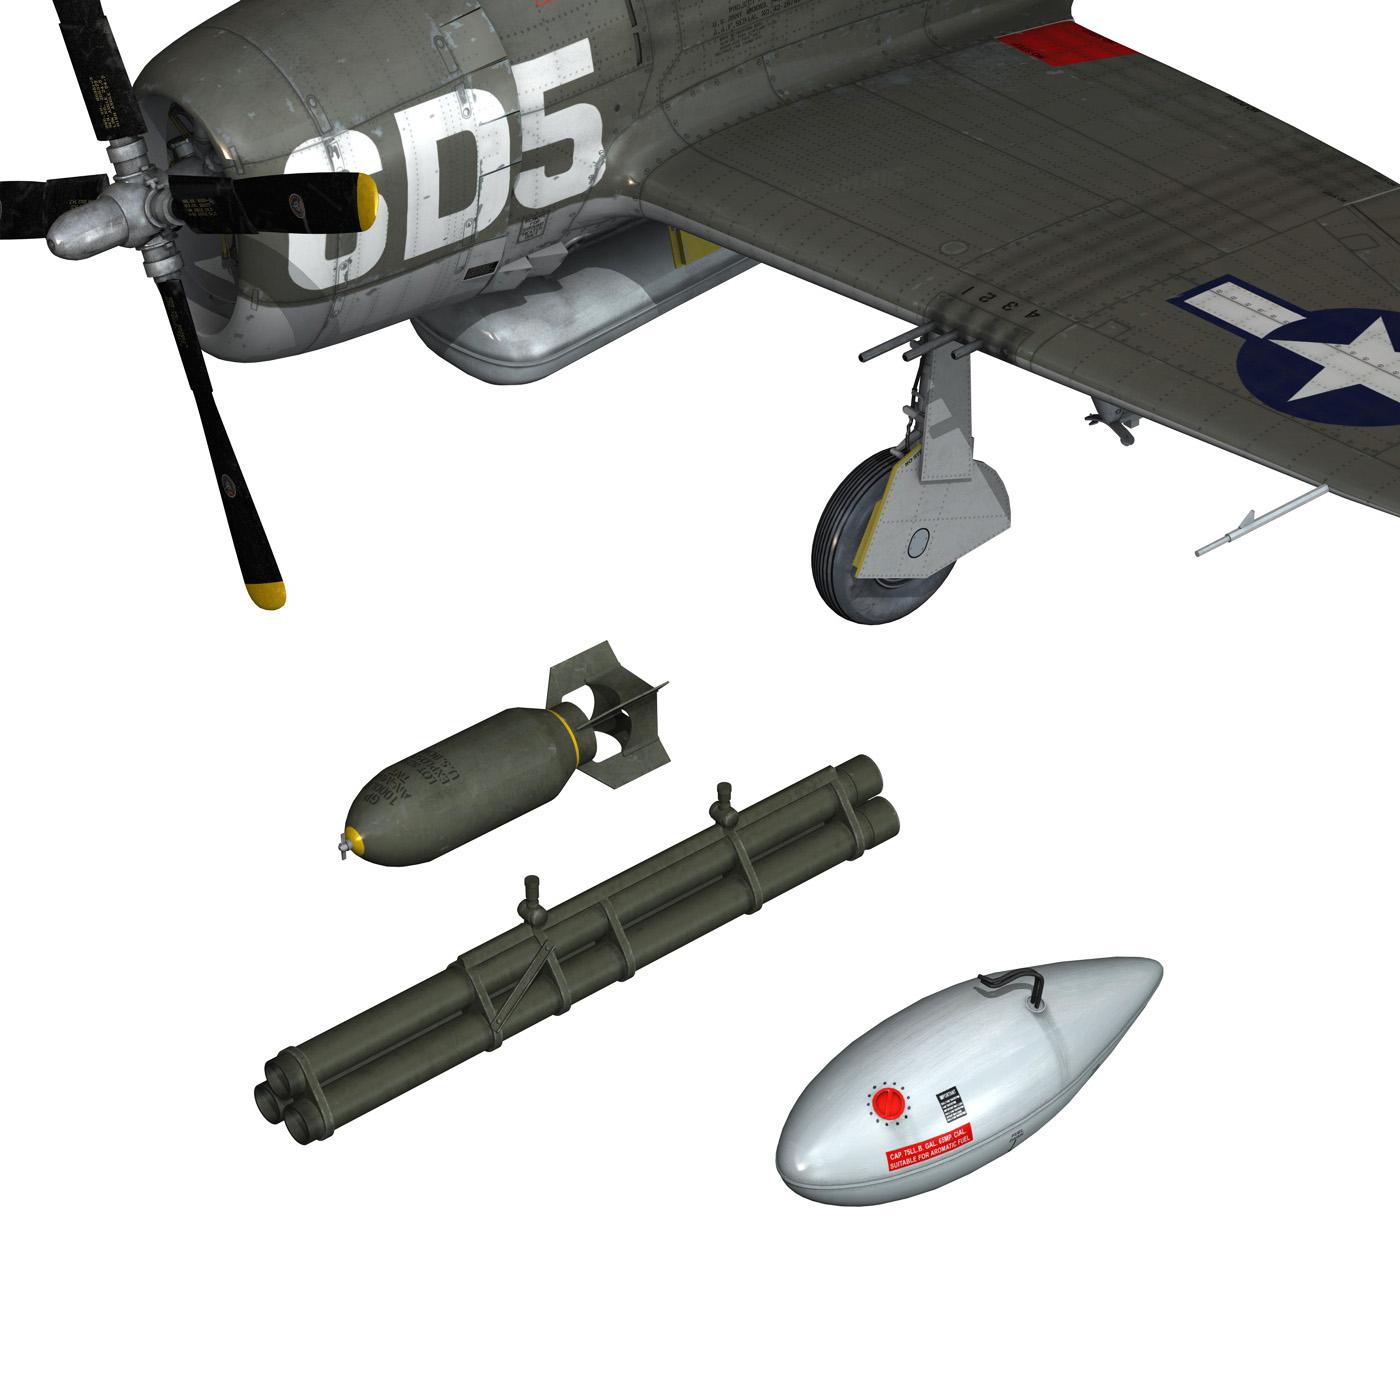 republic p-47 thunderbolt – oh johnnie 3d model fbx c4d lwo obj 274261